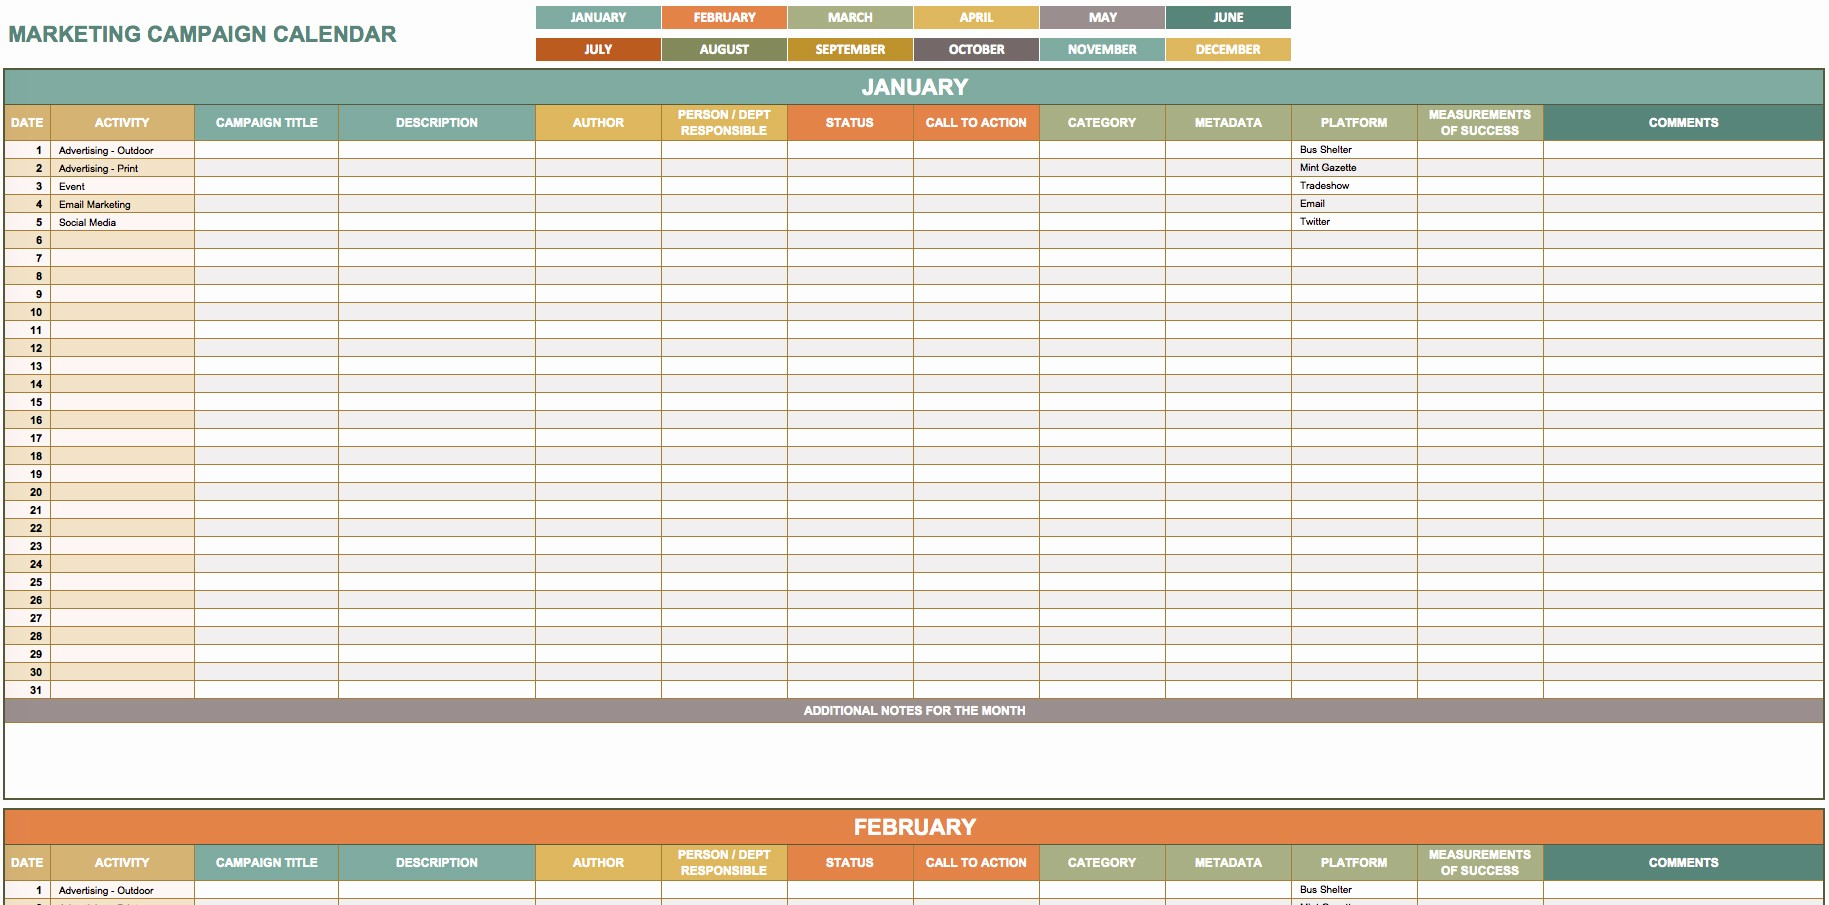 Marketing Calendar Template Excel 2015 Elegant 9 Free Marketing Calendar Templates for Excel Smartsheet